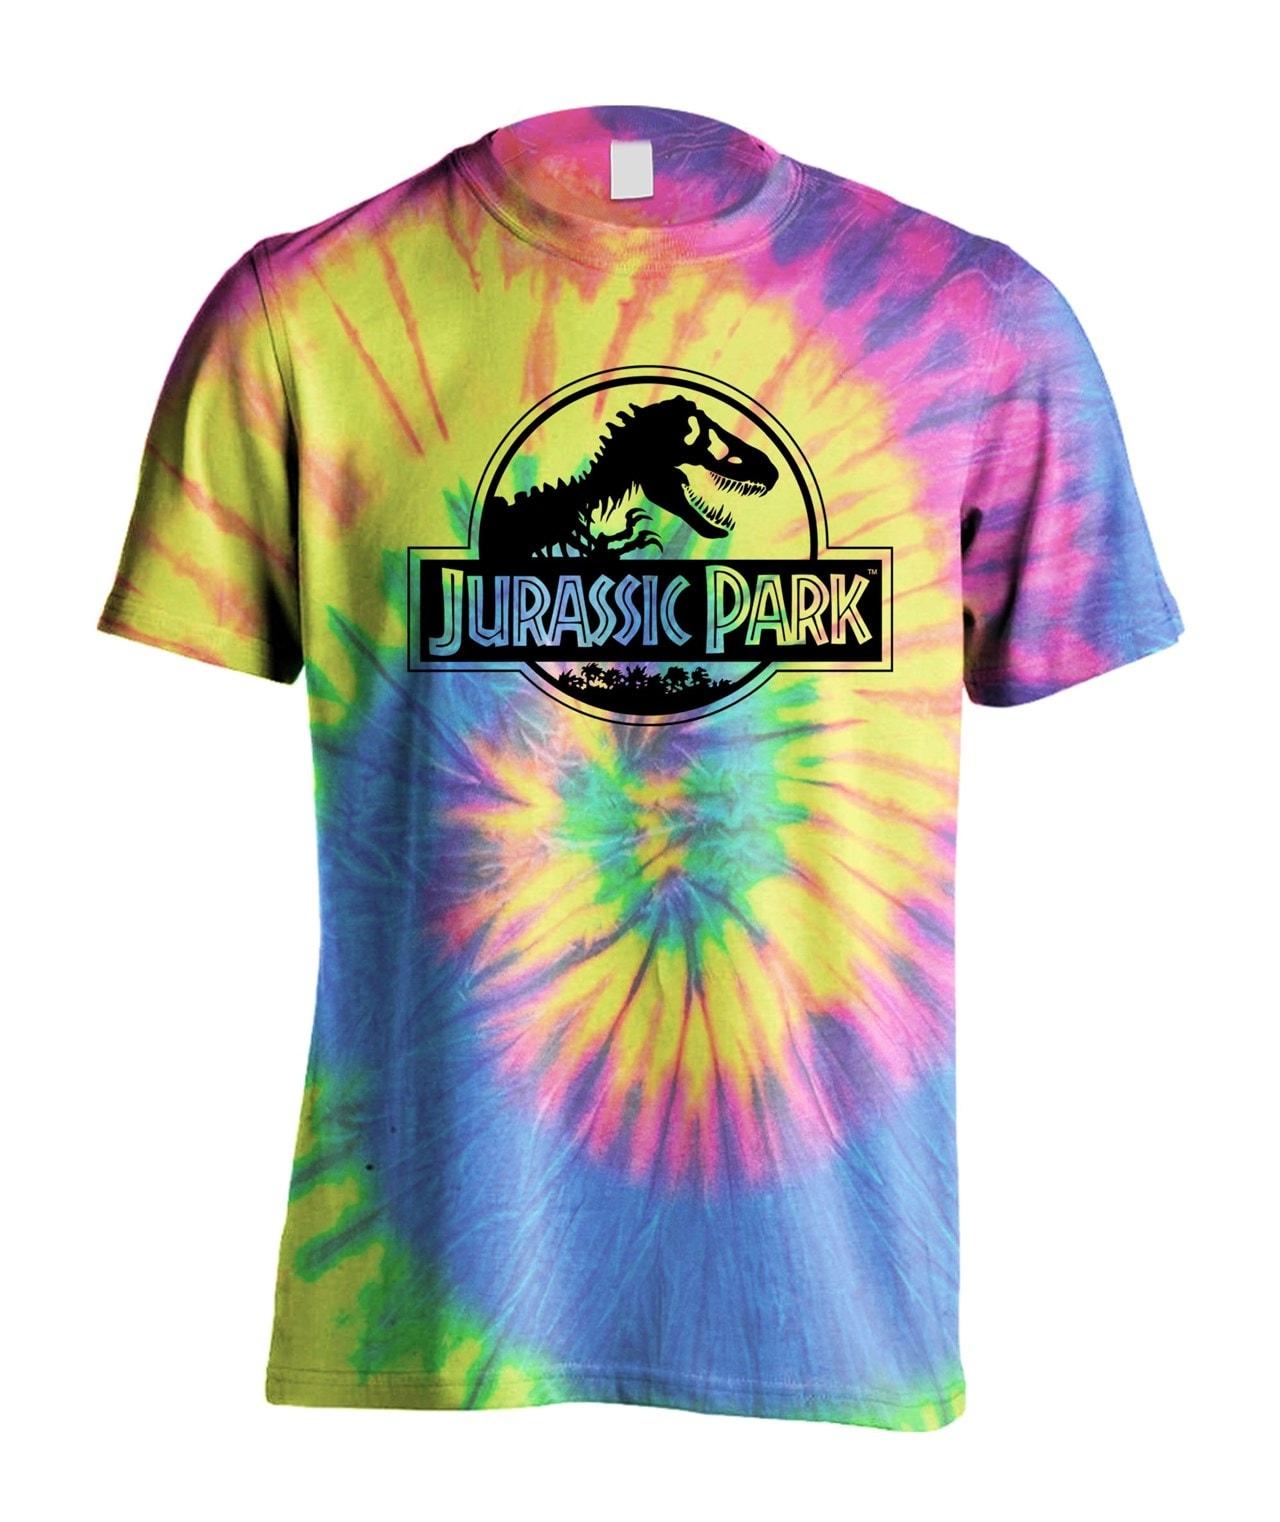 Jurassic Park: Tie Dye Logo: Pretty Vacant Images (hmv Exclusive) (Small) - 1